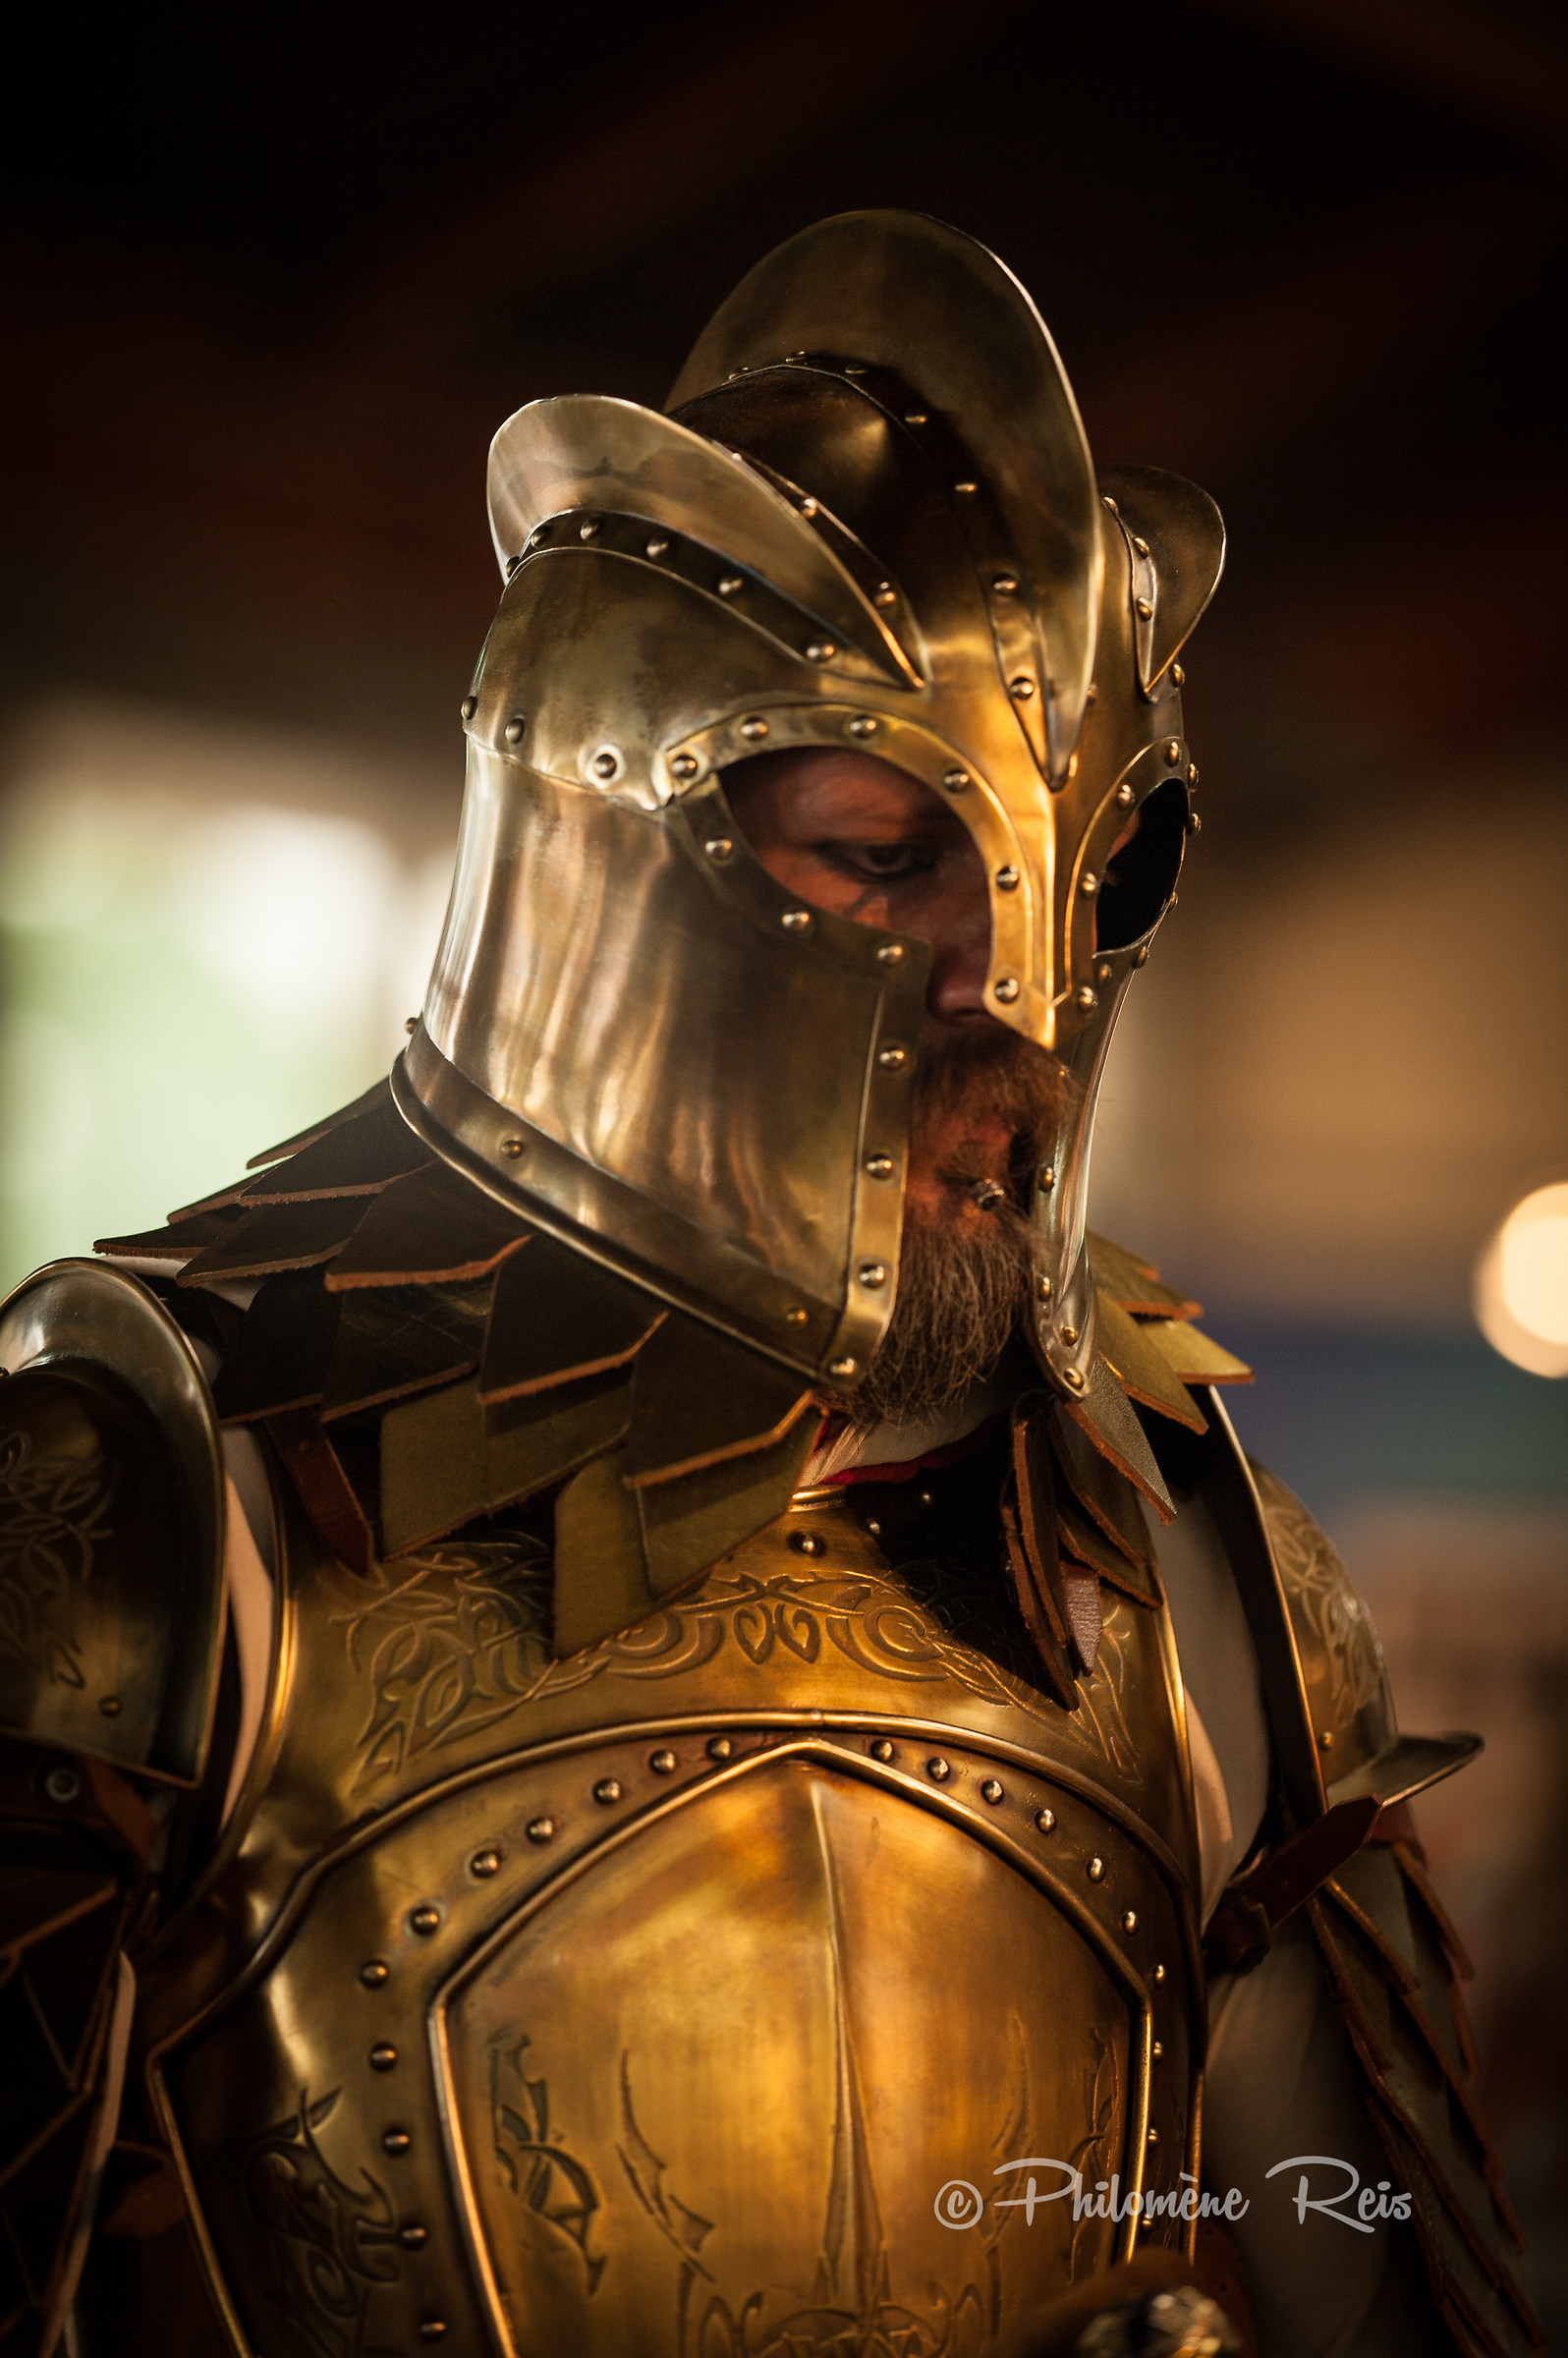 Knight...